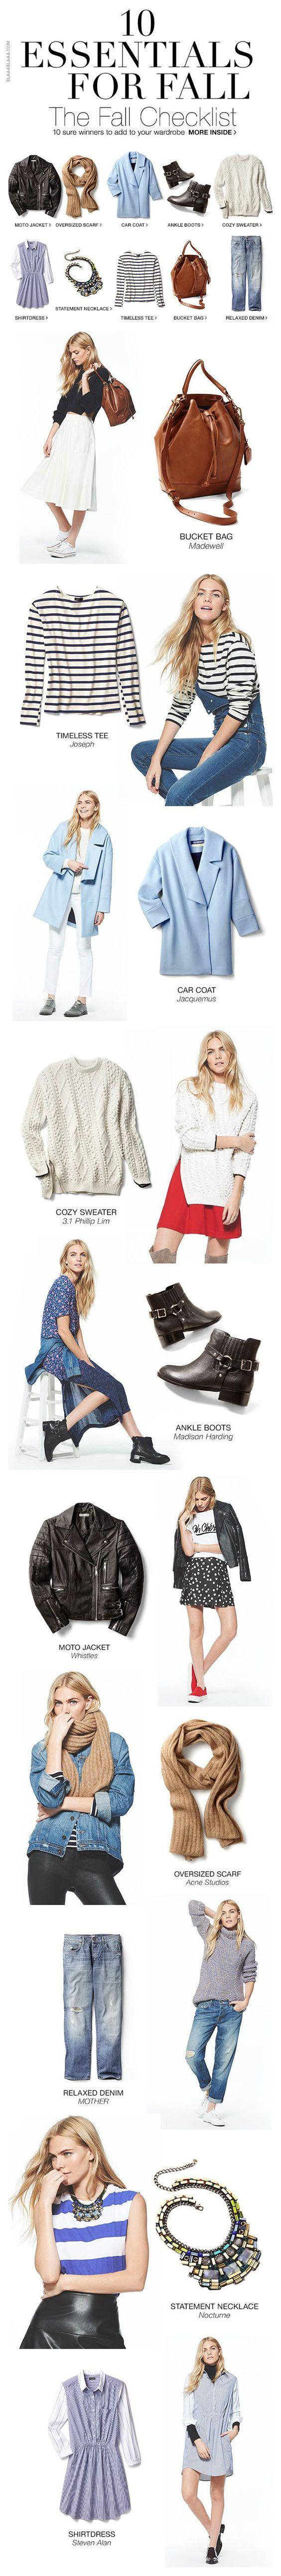 (42) Shopbop – 10 Essentials for Fall | Style my wardrobe: Autumn/Winter |…